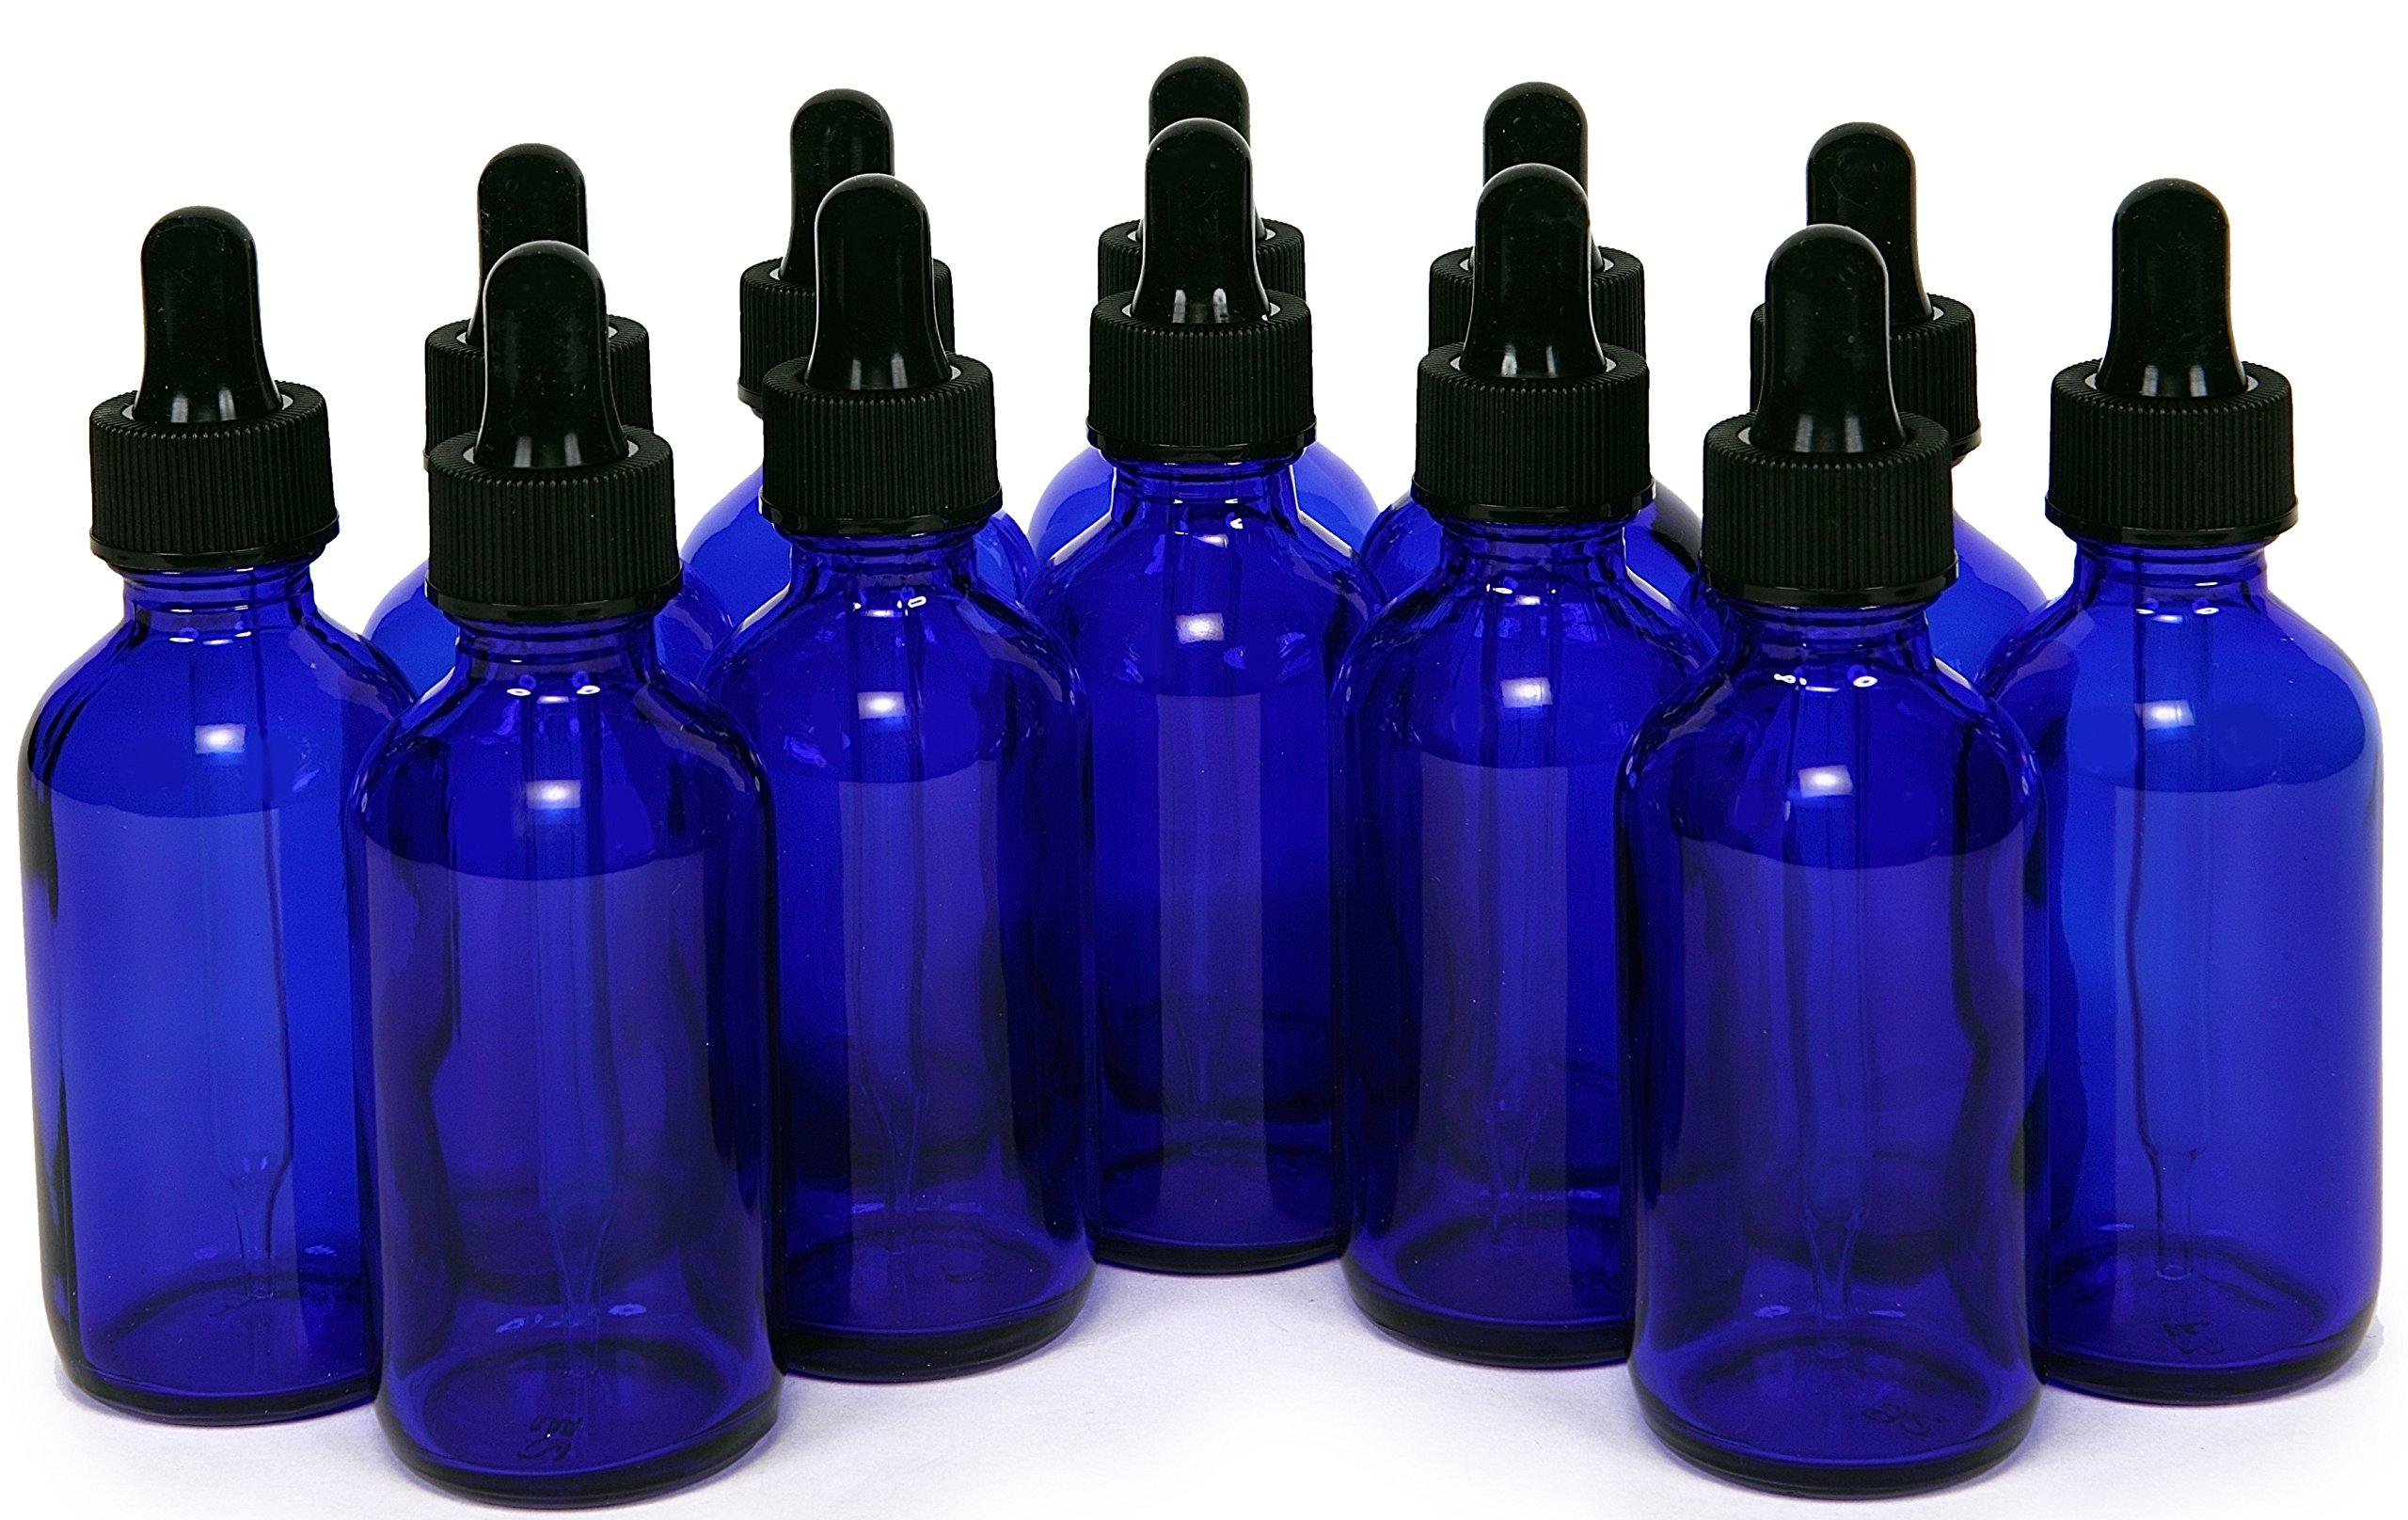 12, Cobalt Blue, 2 oz, Glass Bottles, with Glass Eye Droppers by Vivaplex